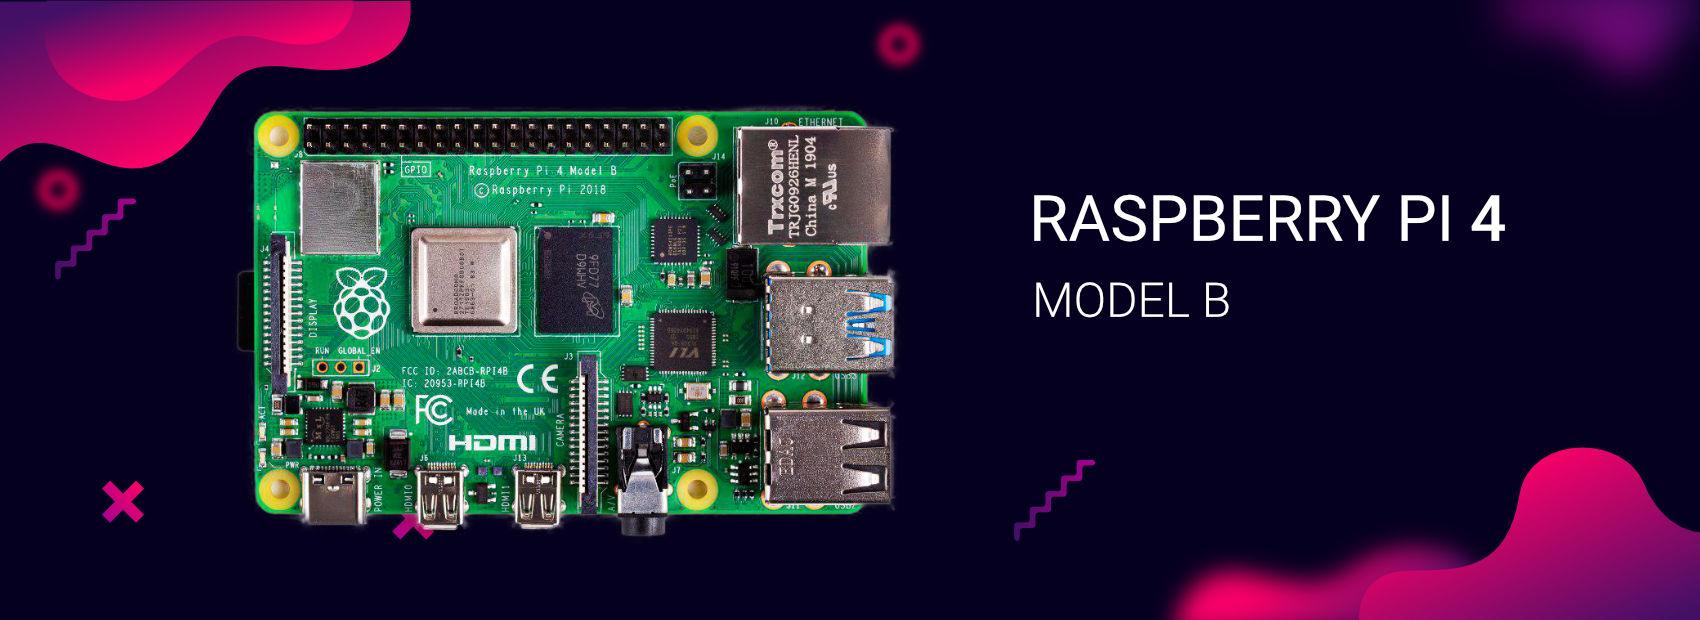 Raspberry Pi 4 Banner